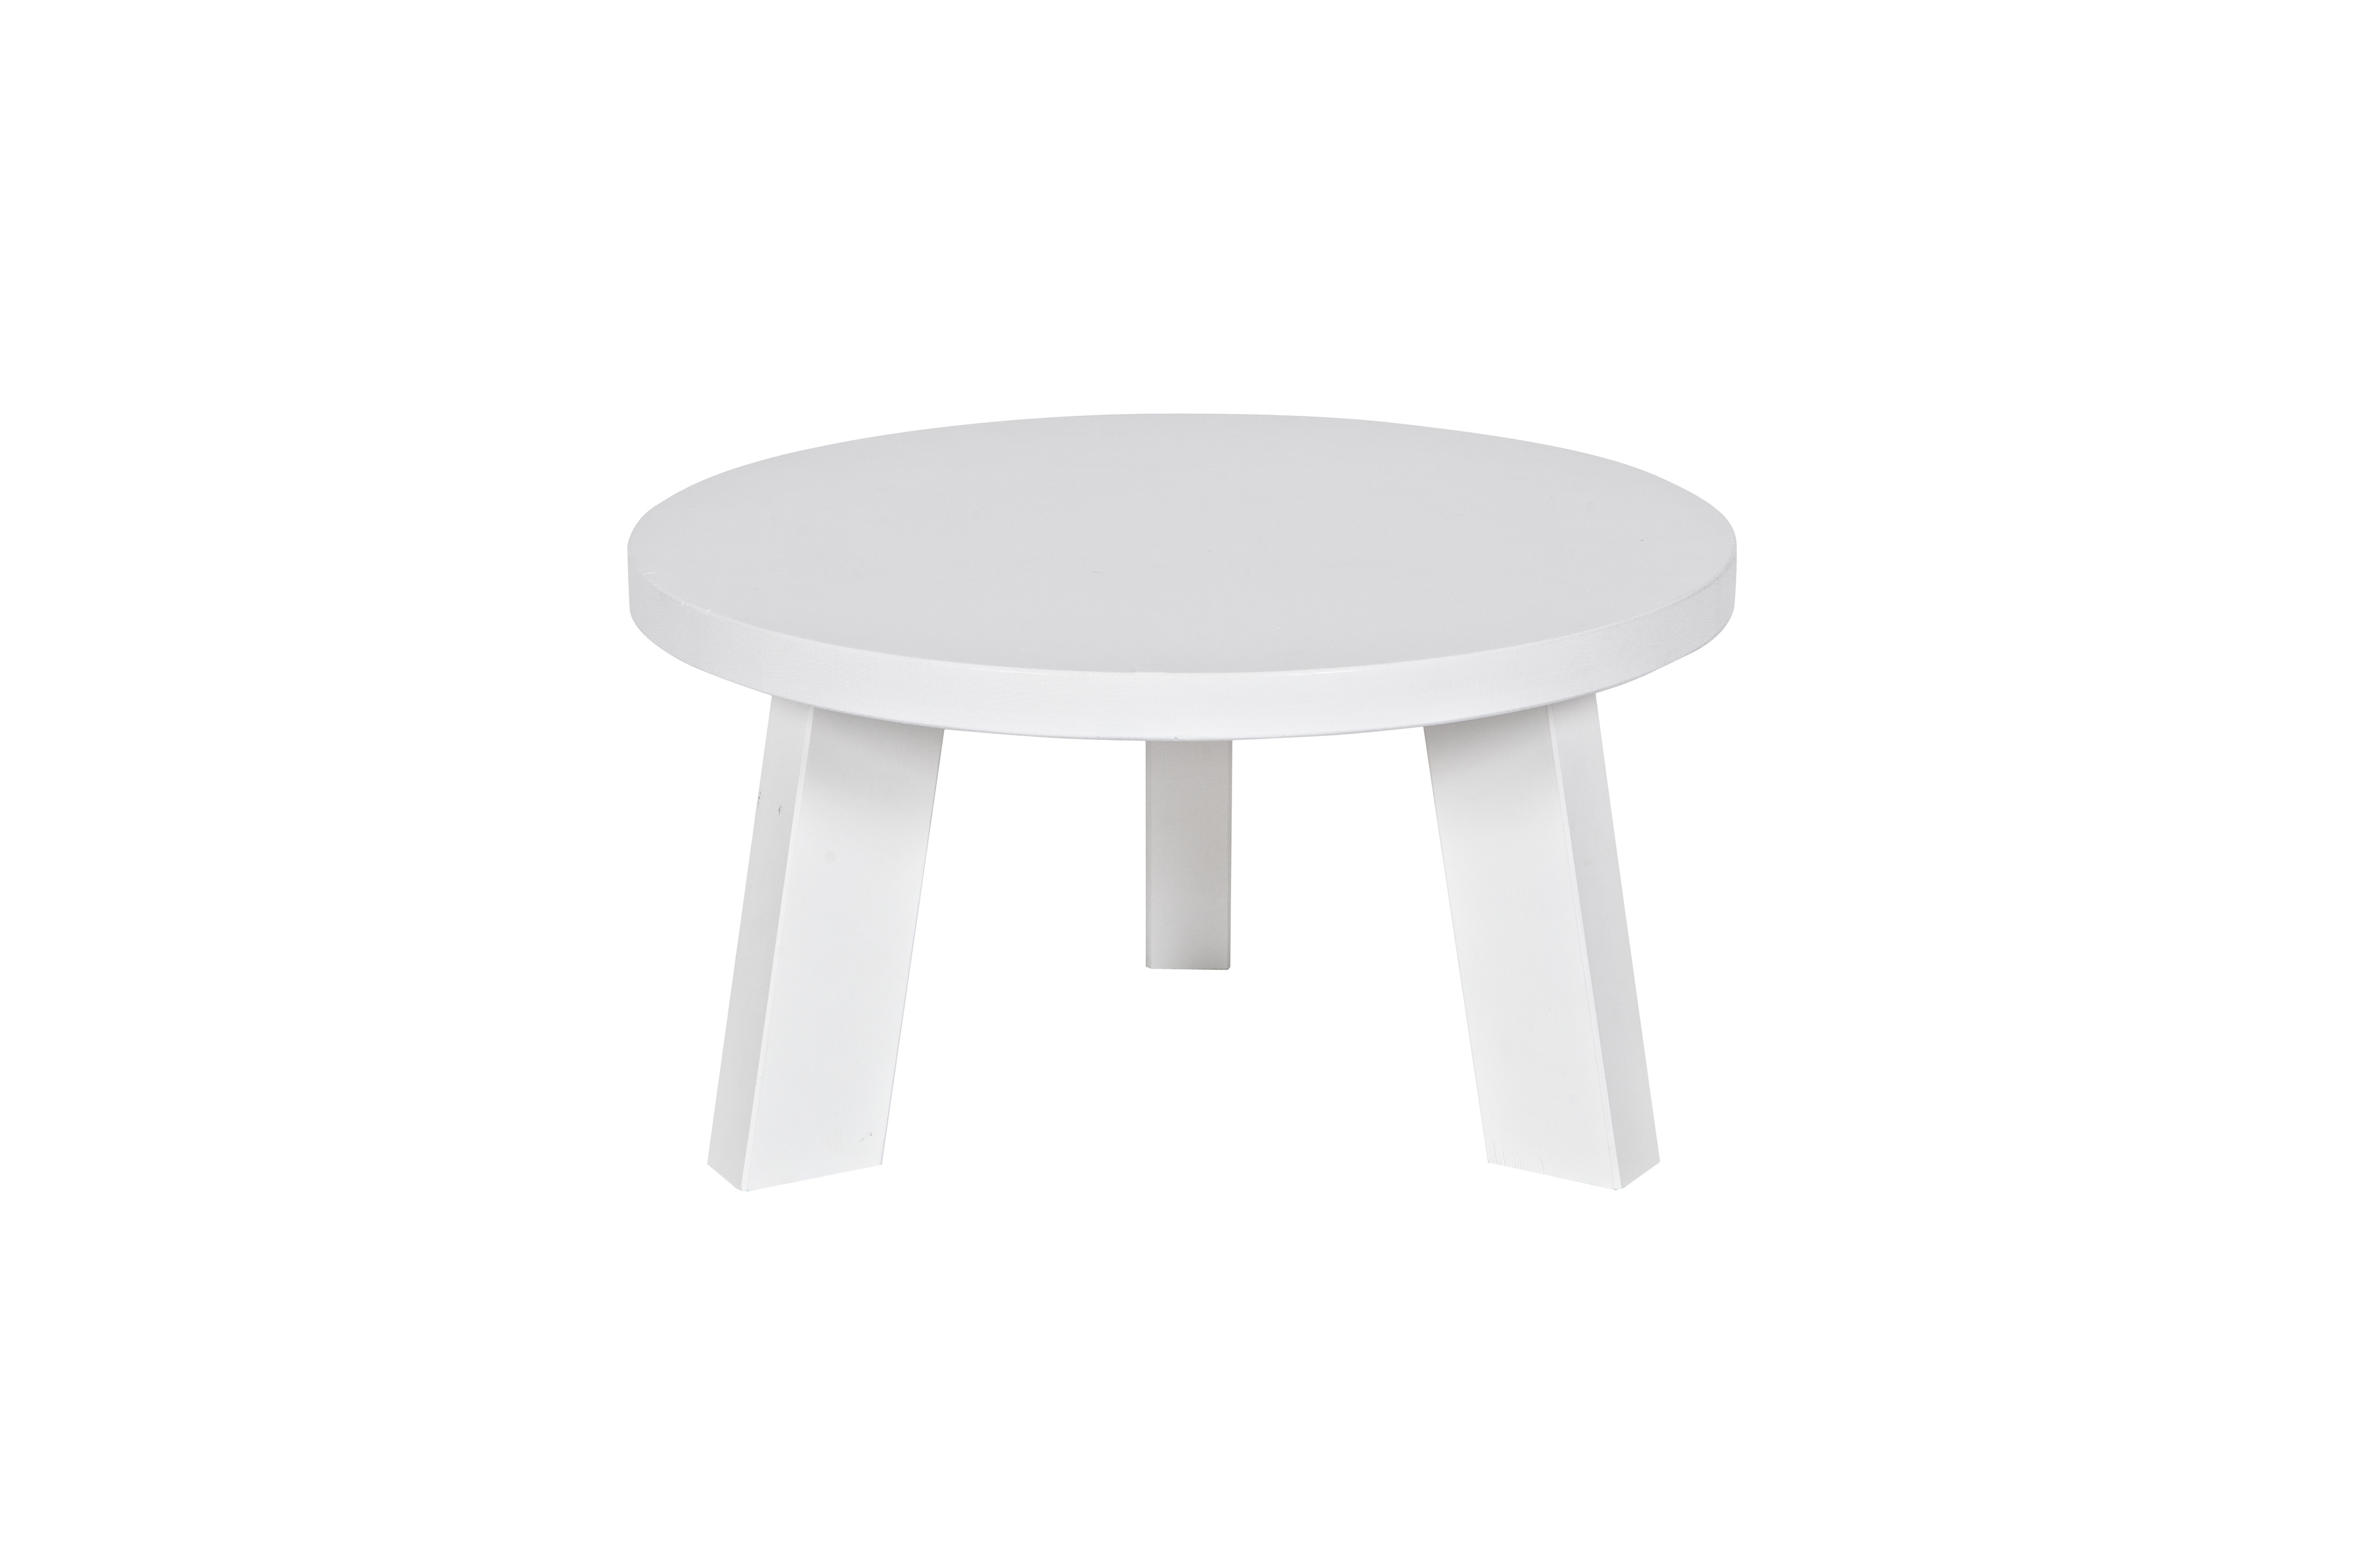 Ronde tafel ikea free ovale eettafel with ronde tafel ikea top